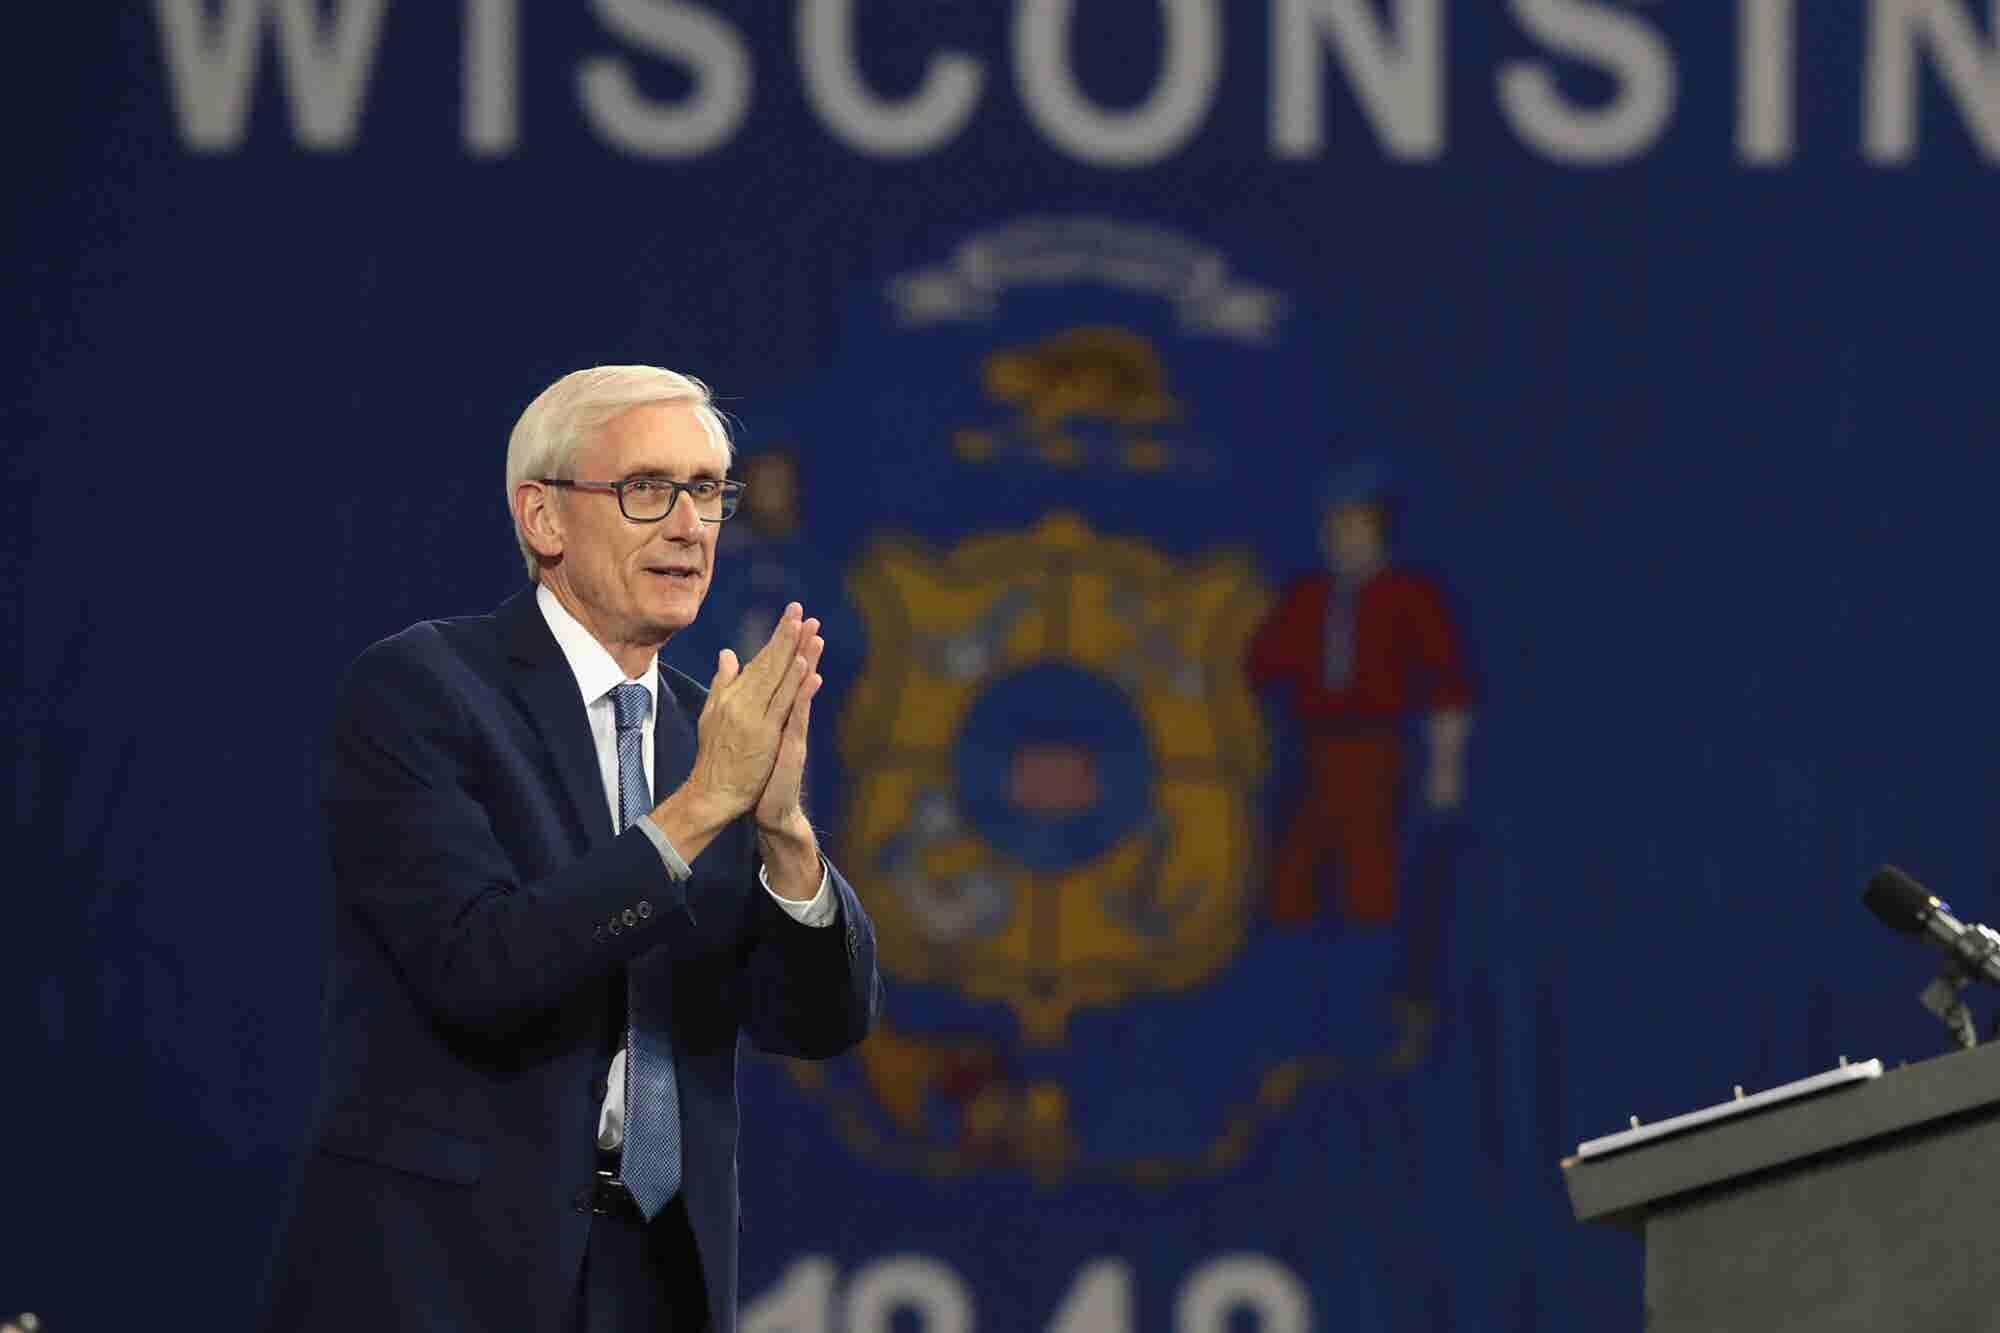 Wisconsin Governor Backs Effort to Decriminalize Marijuana